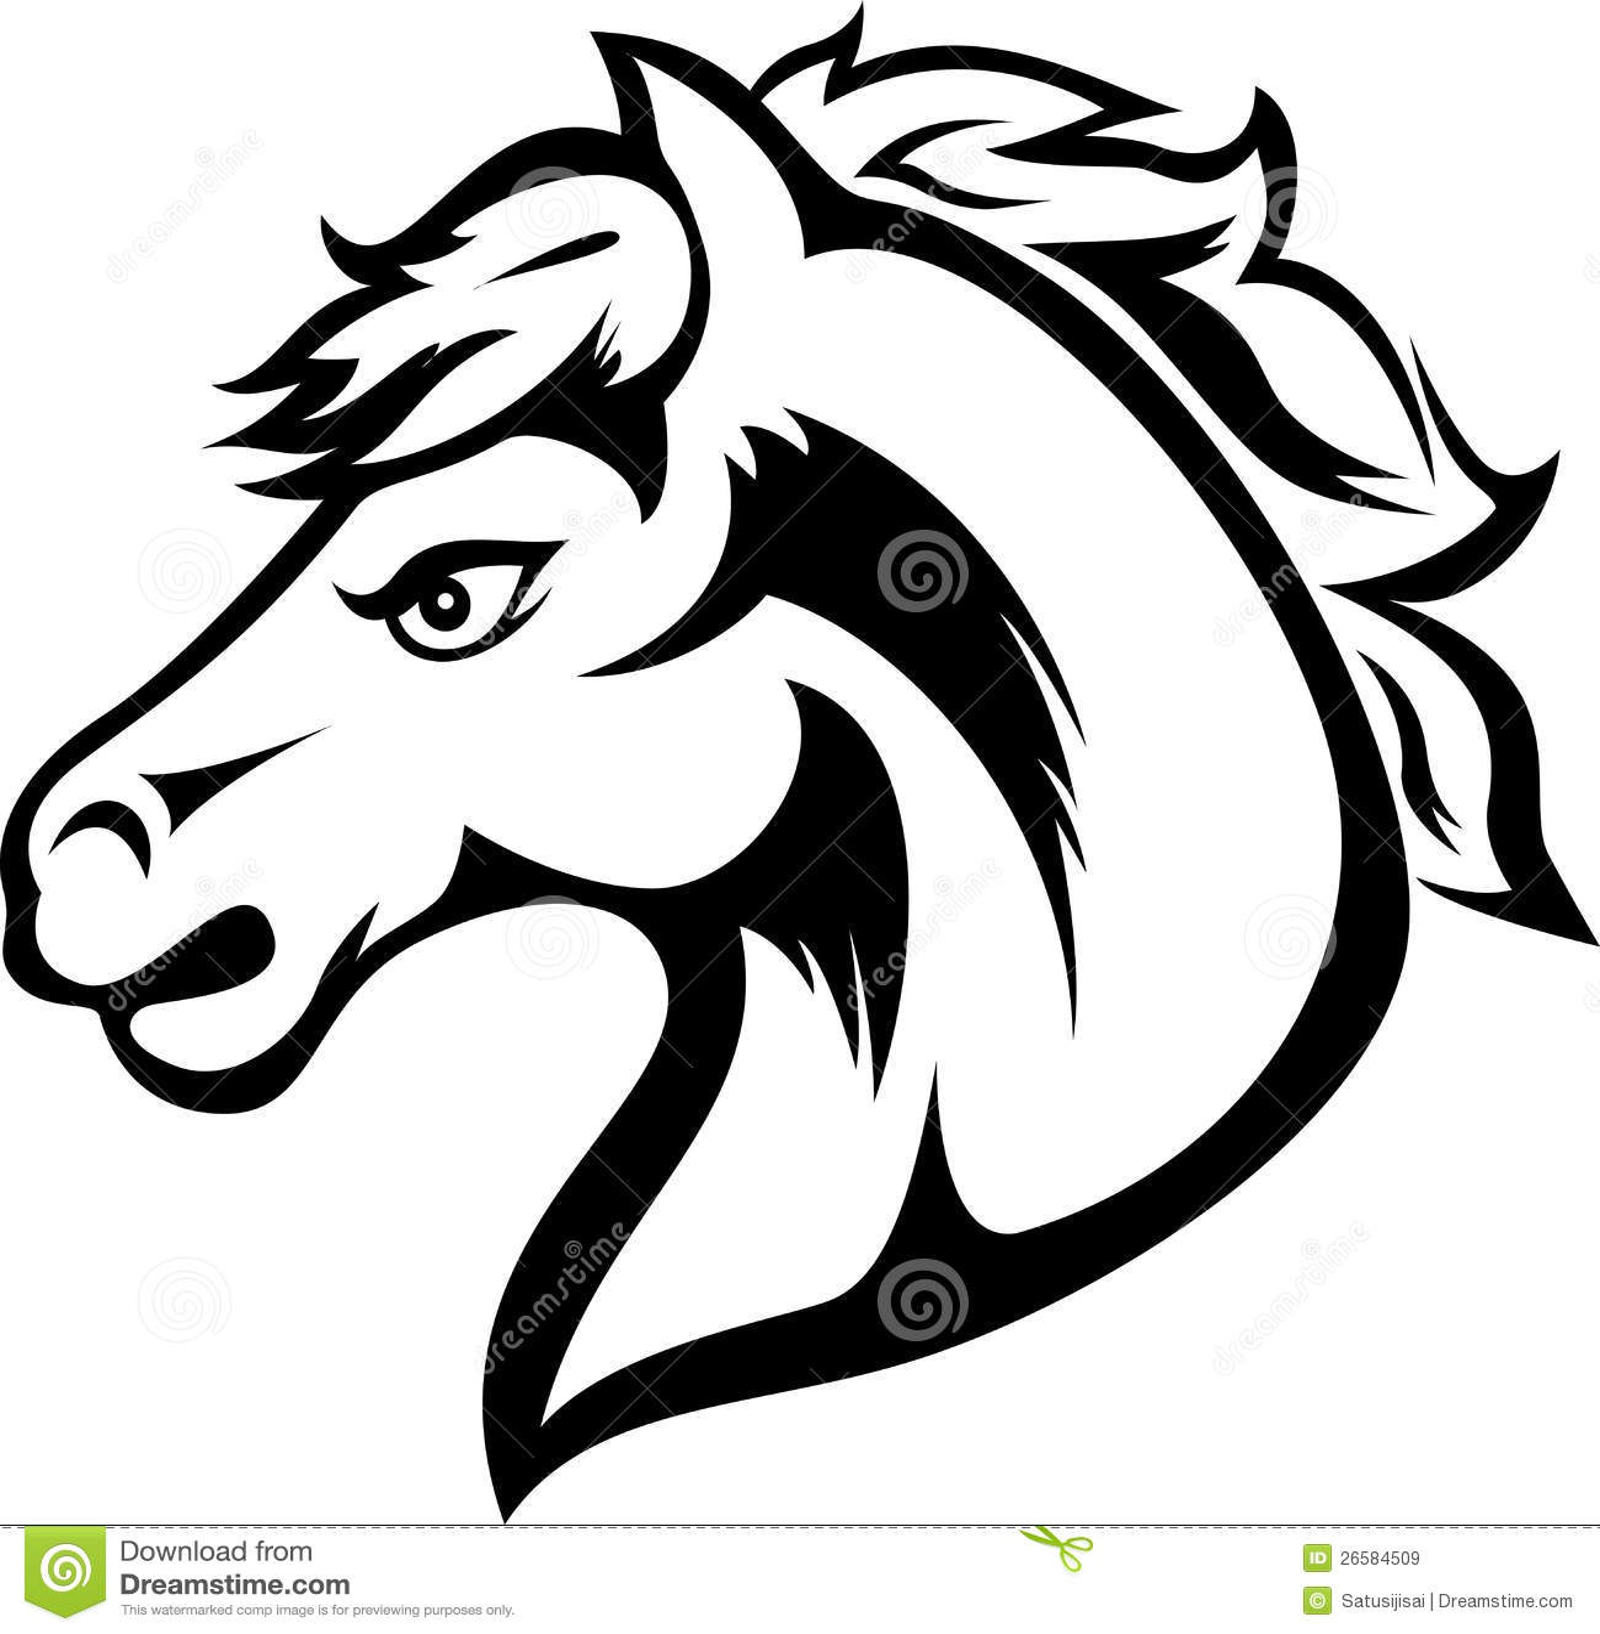 5a0fcaeca Horse head tattoo stock vector. Illustration of language - 26584509